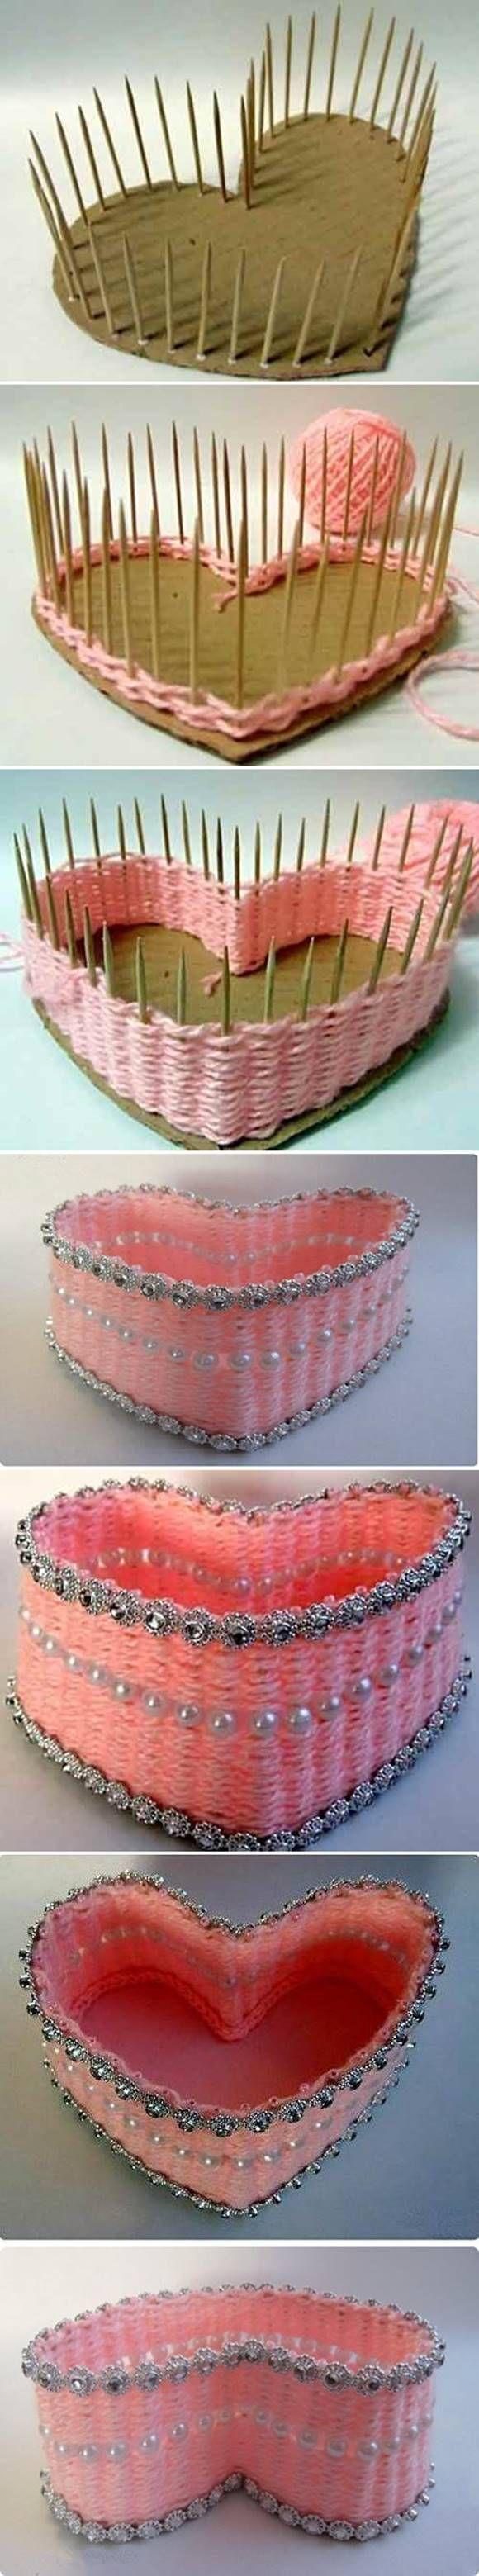 How to DIY Yarn Woven Heart Shaped Basket